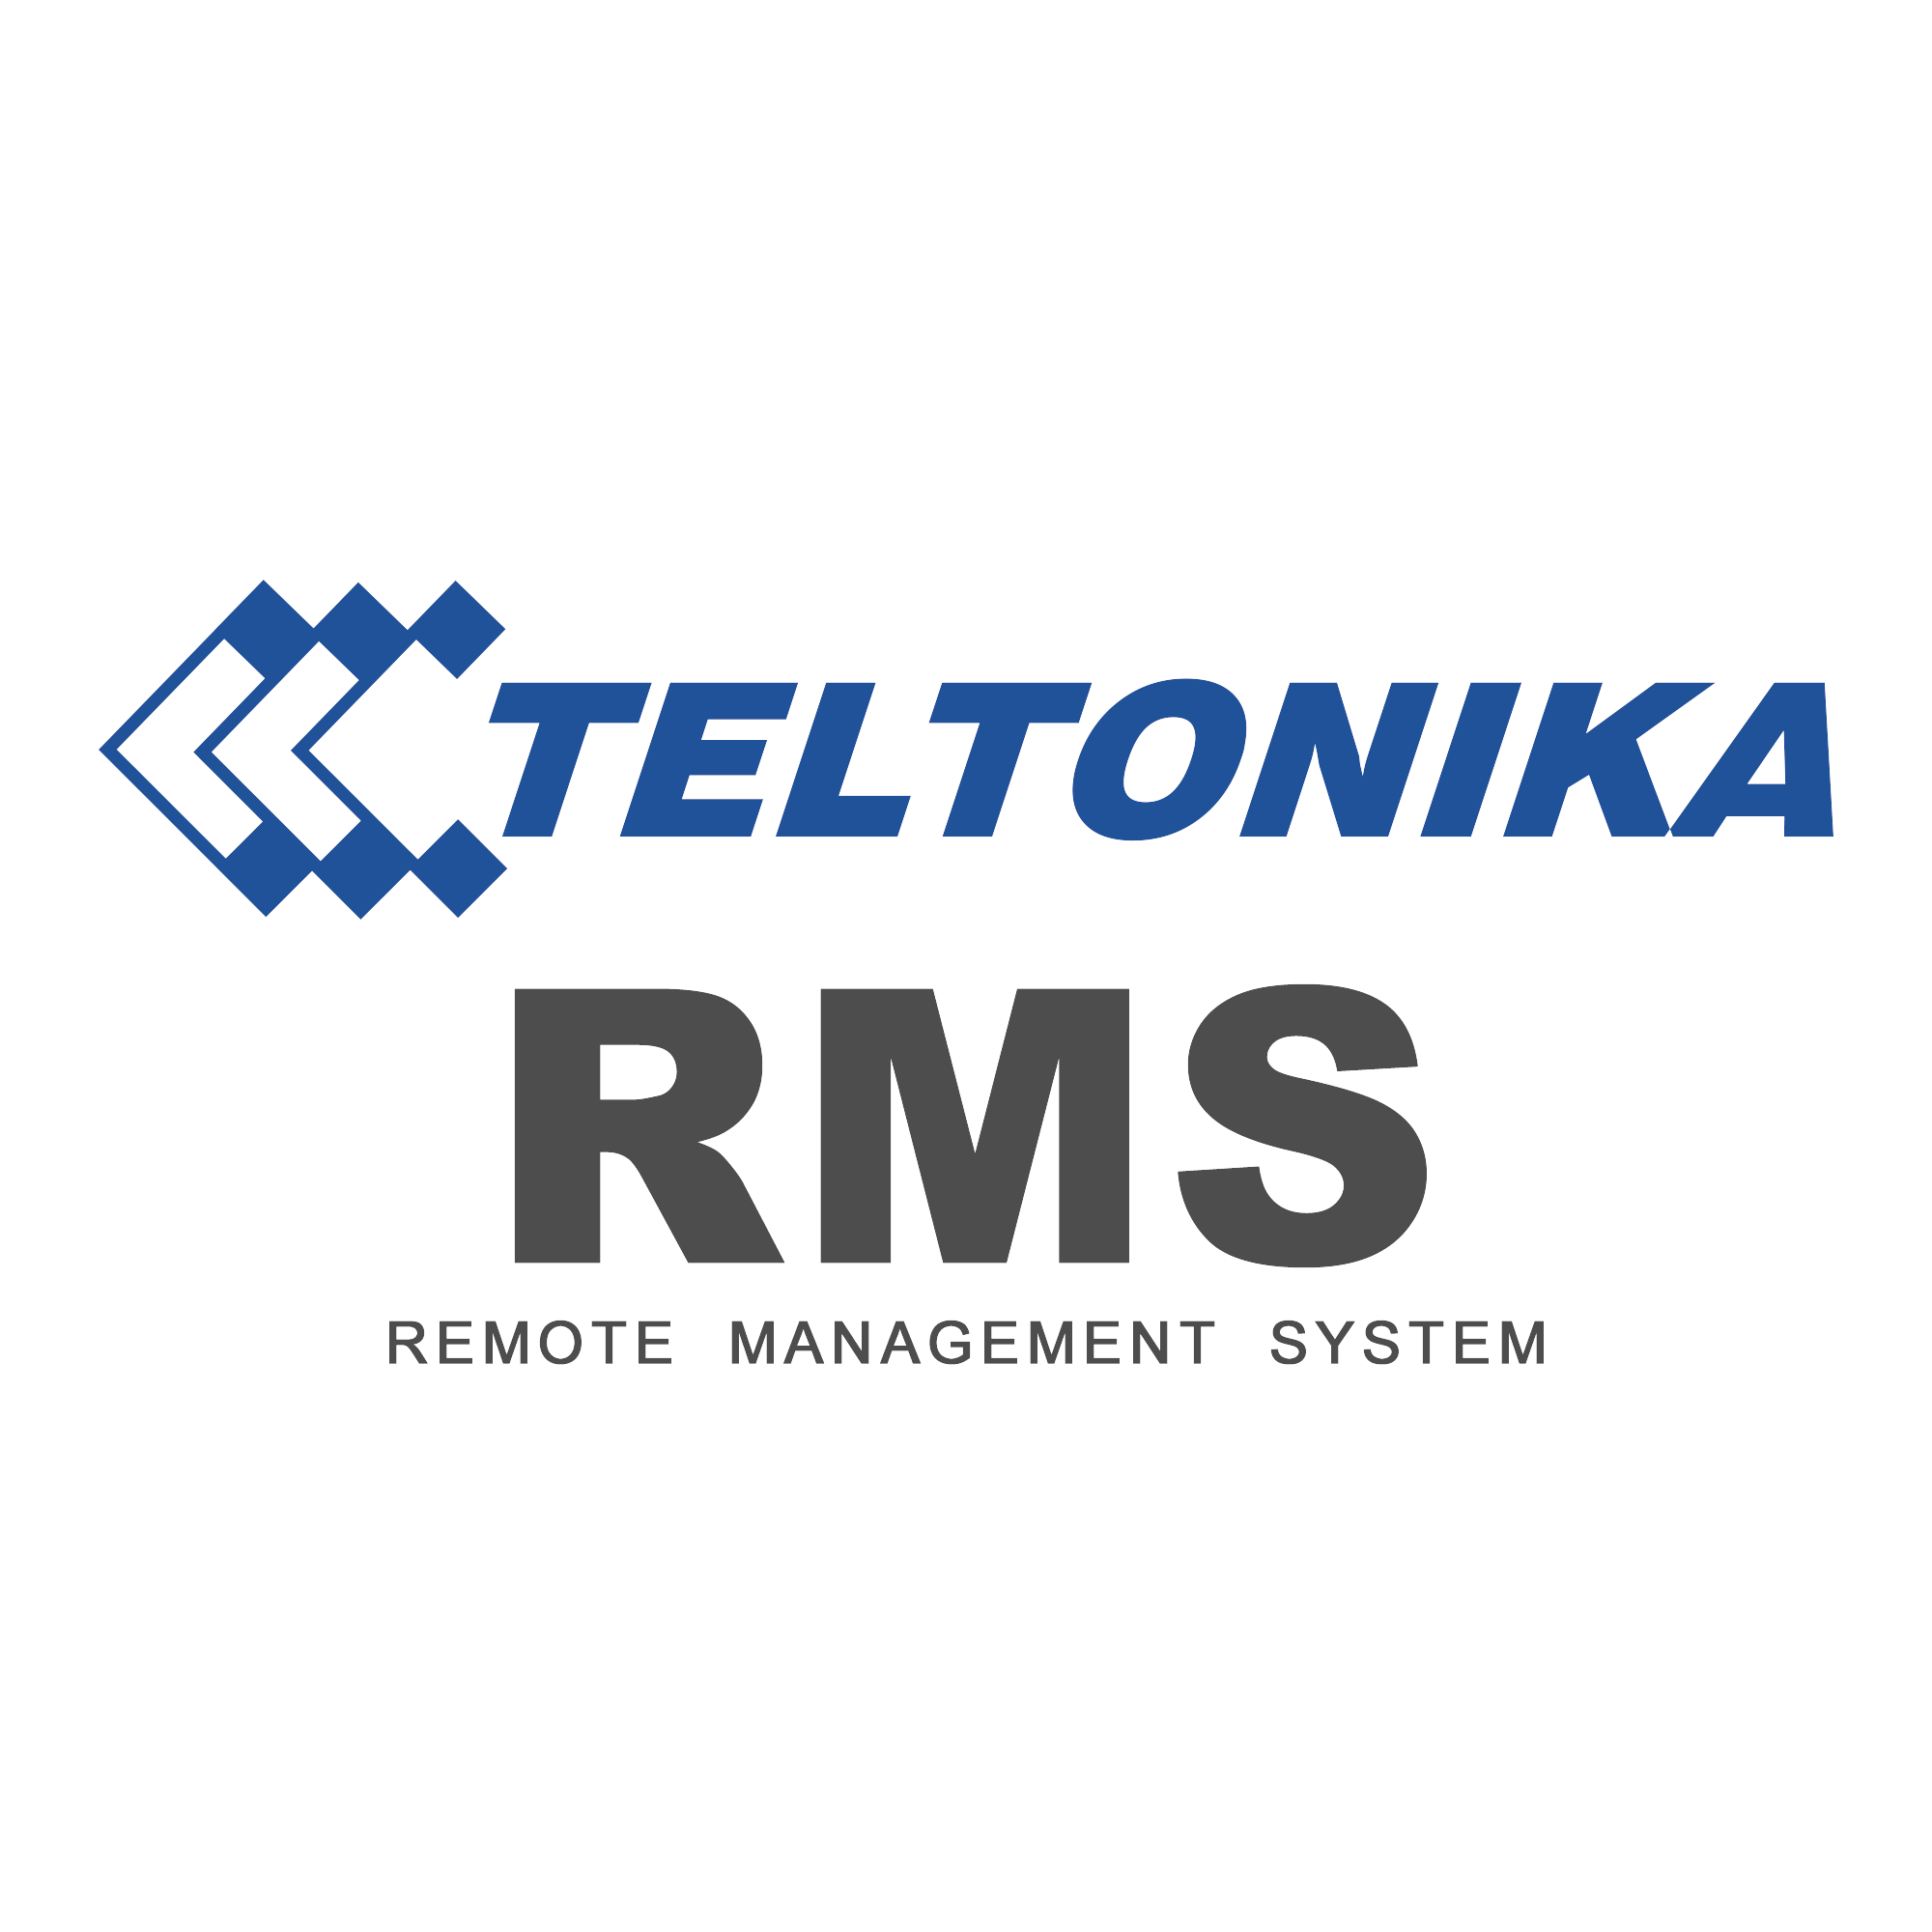 Licencia RMS Teltonika (Remote Management System) 1 Credito